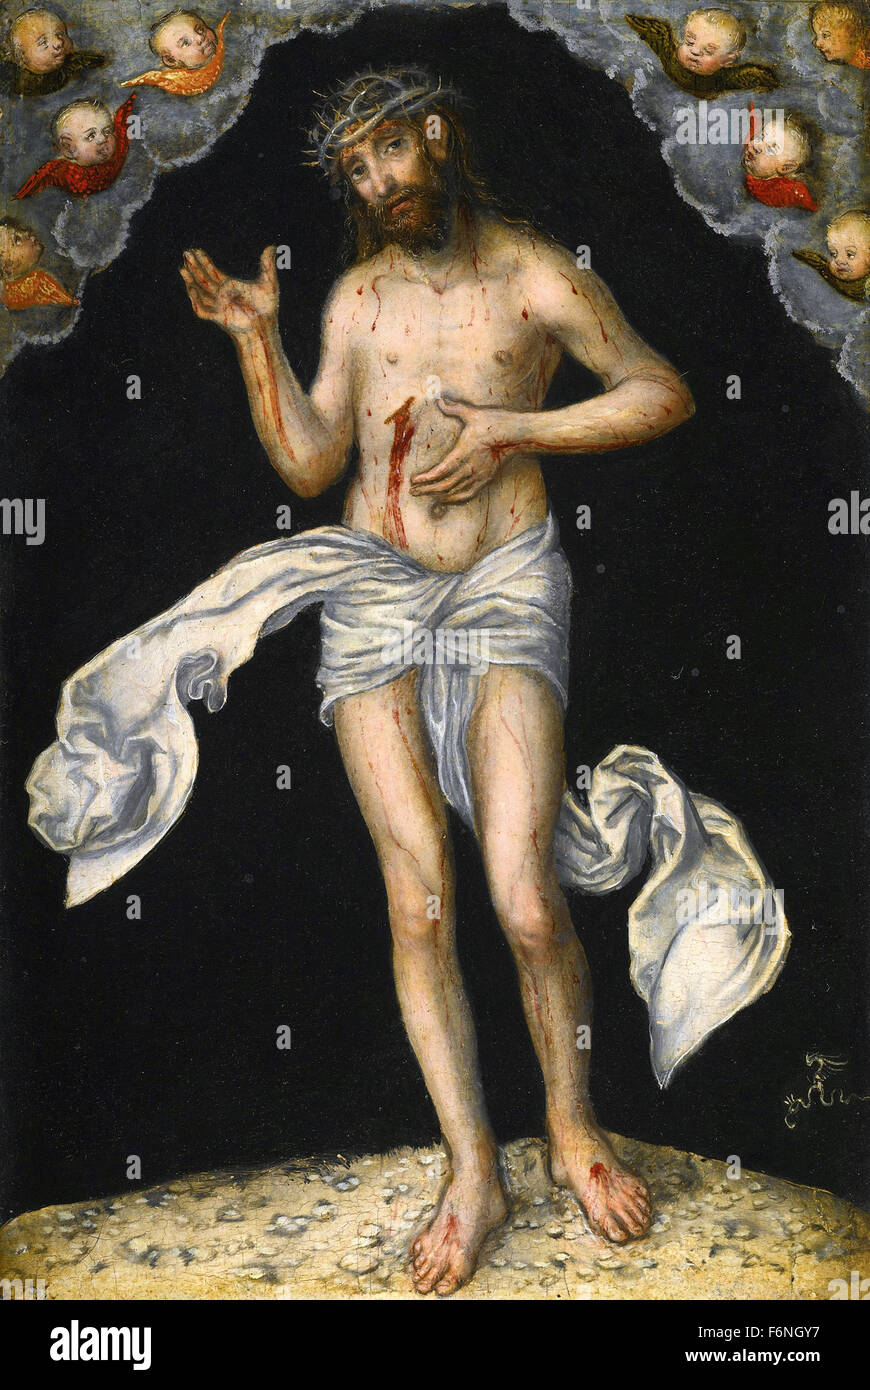 Lucas Cranach the Elder - Christ as Man of Sorrows Stock Photo